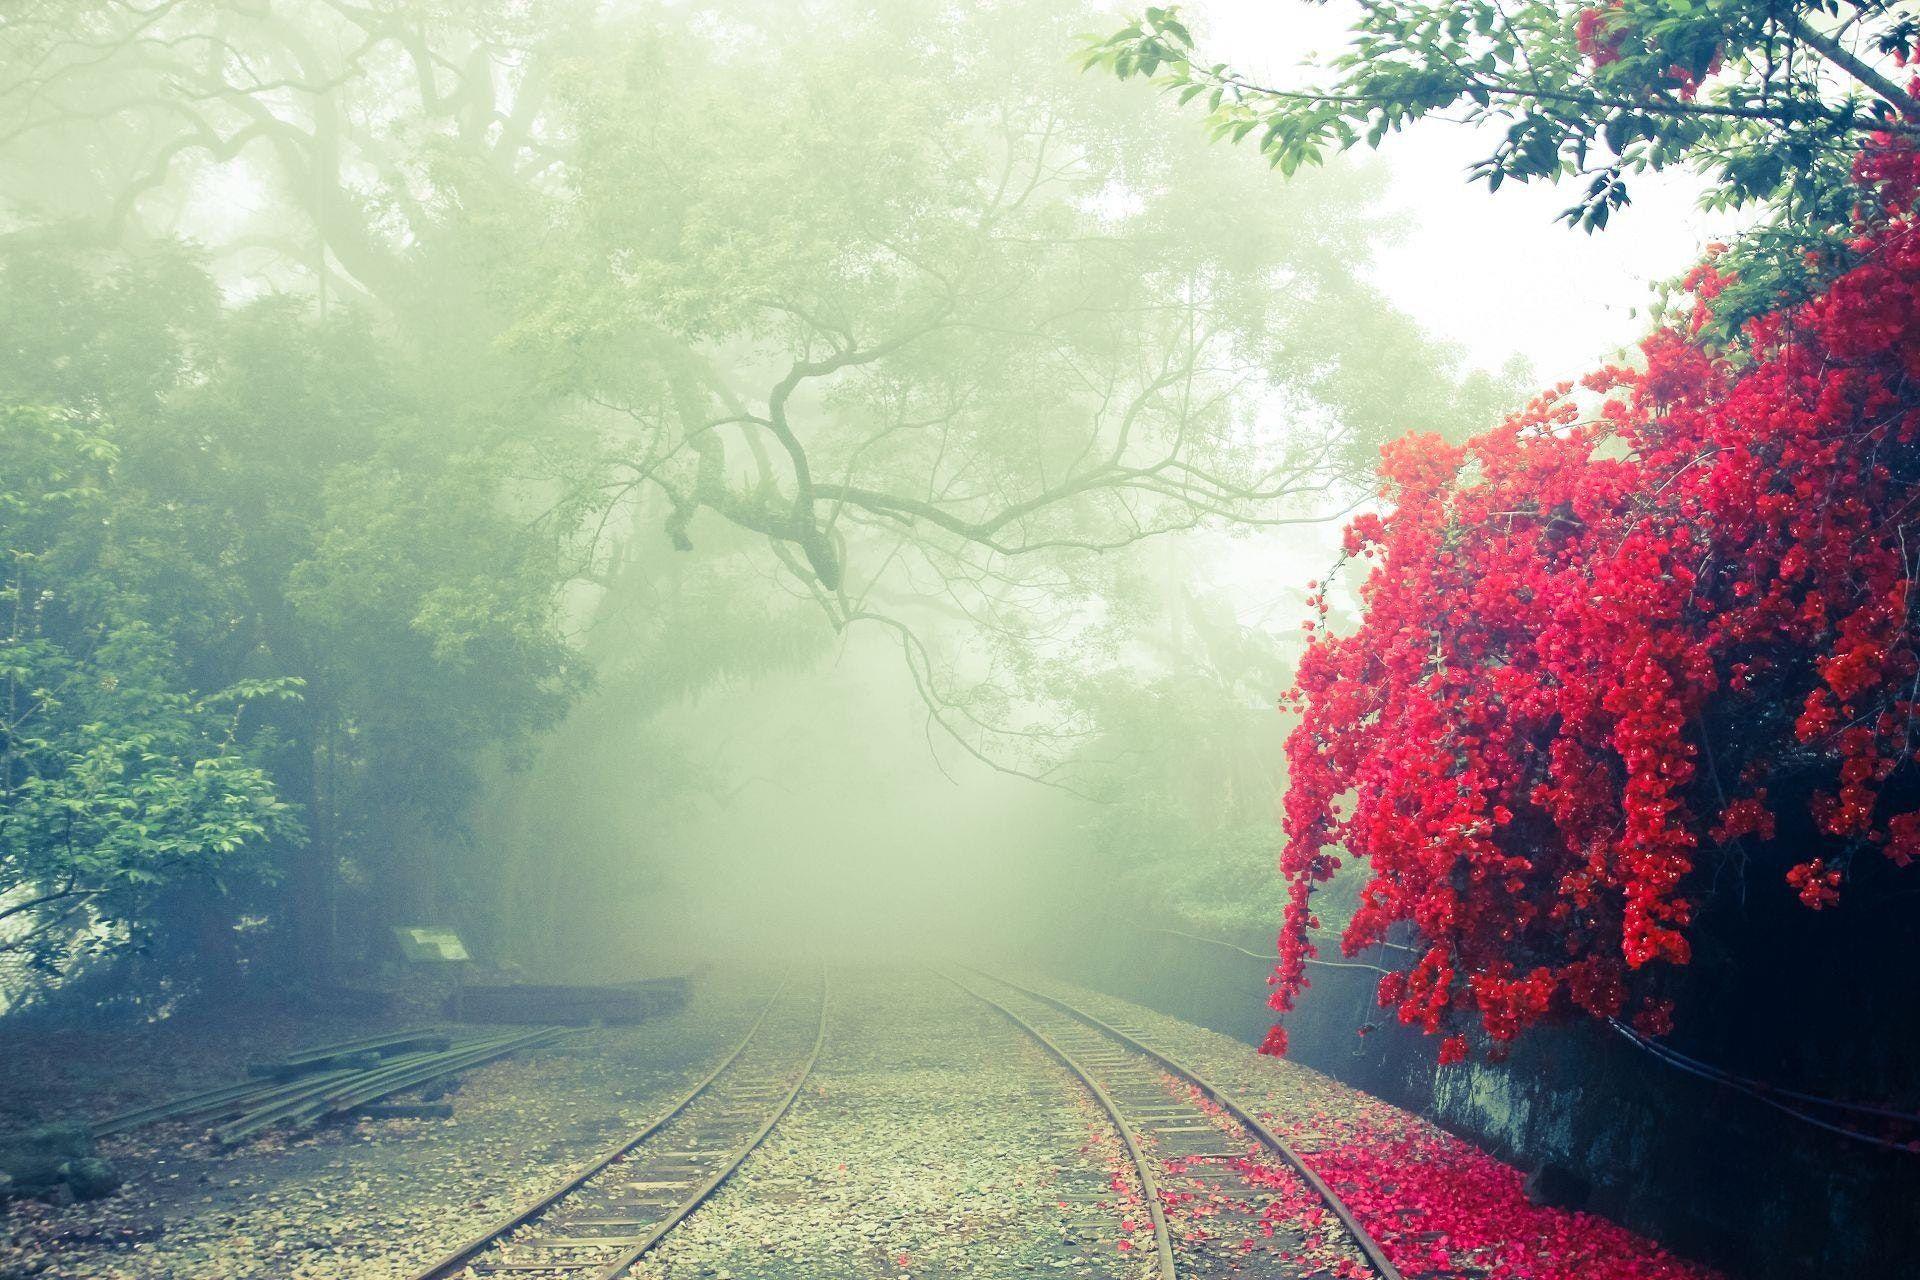 عکس زمینه ریل راه آهن در مه بهاری پس زمینه